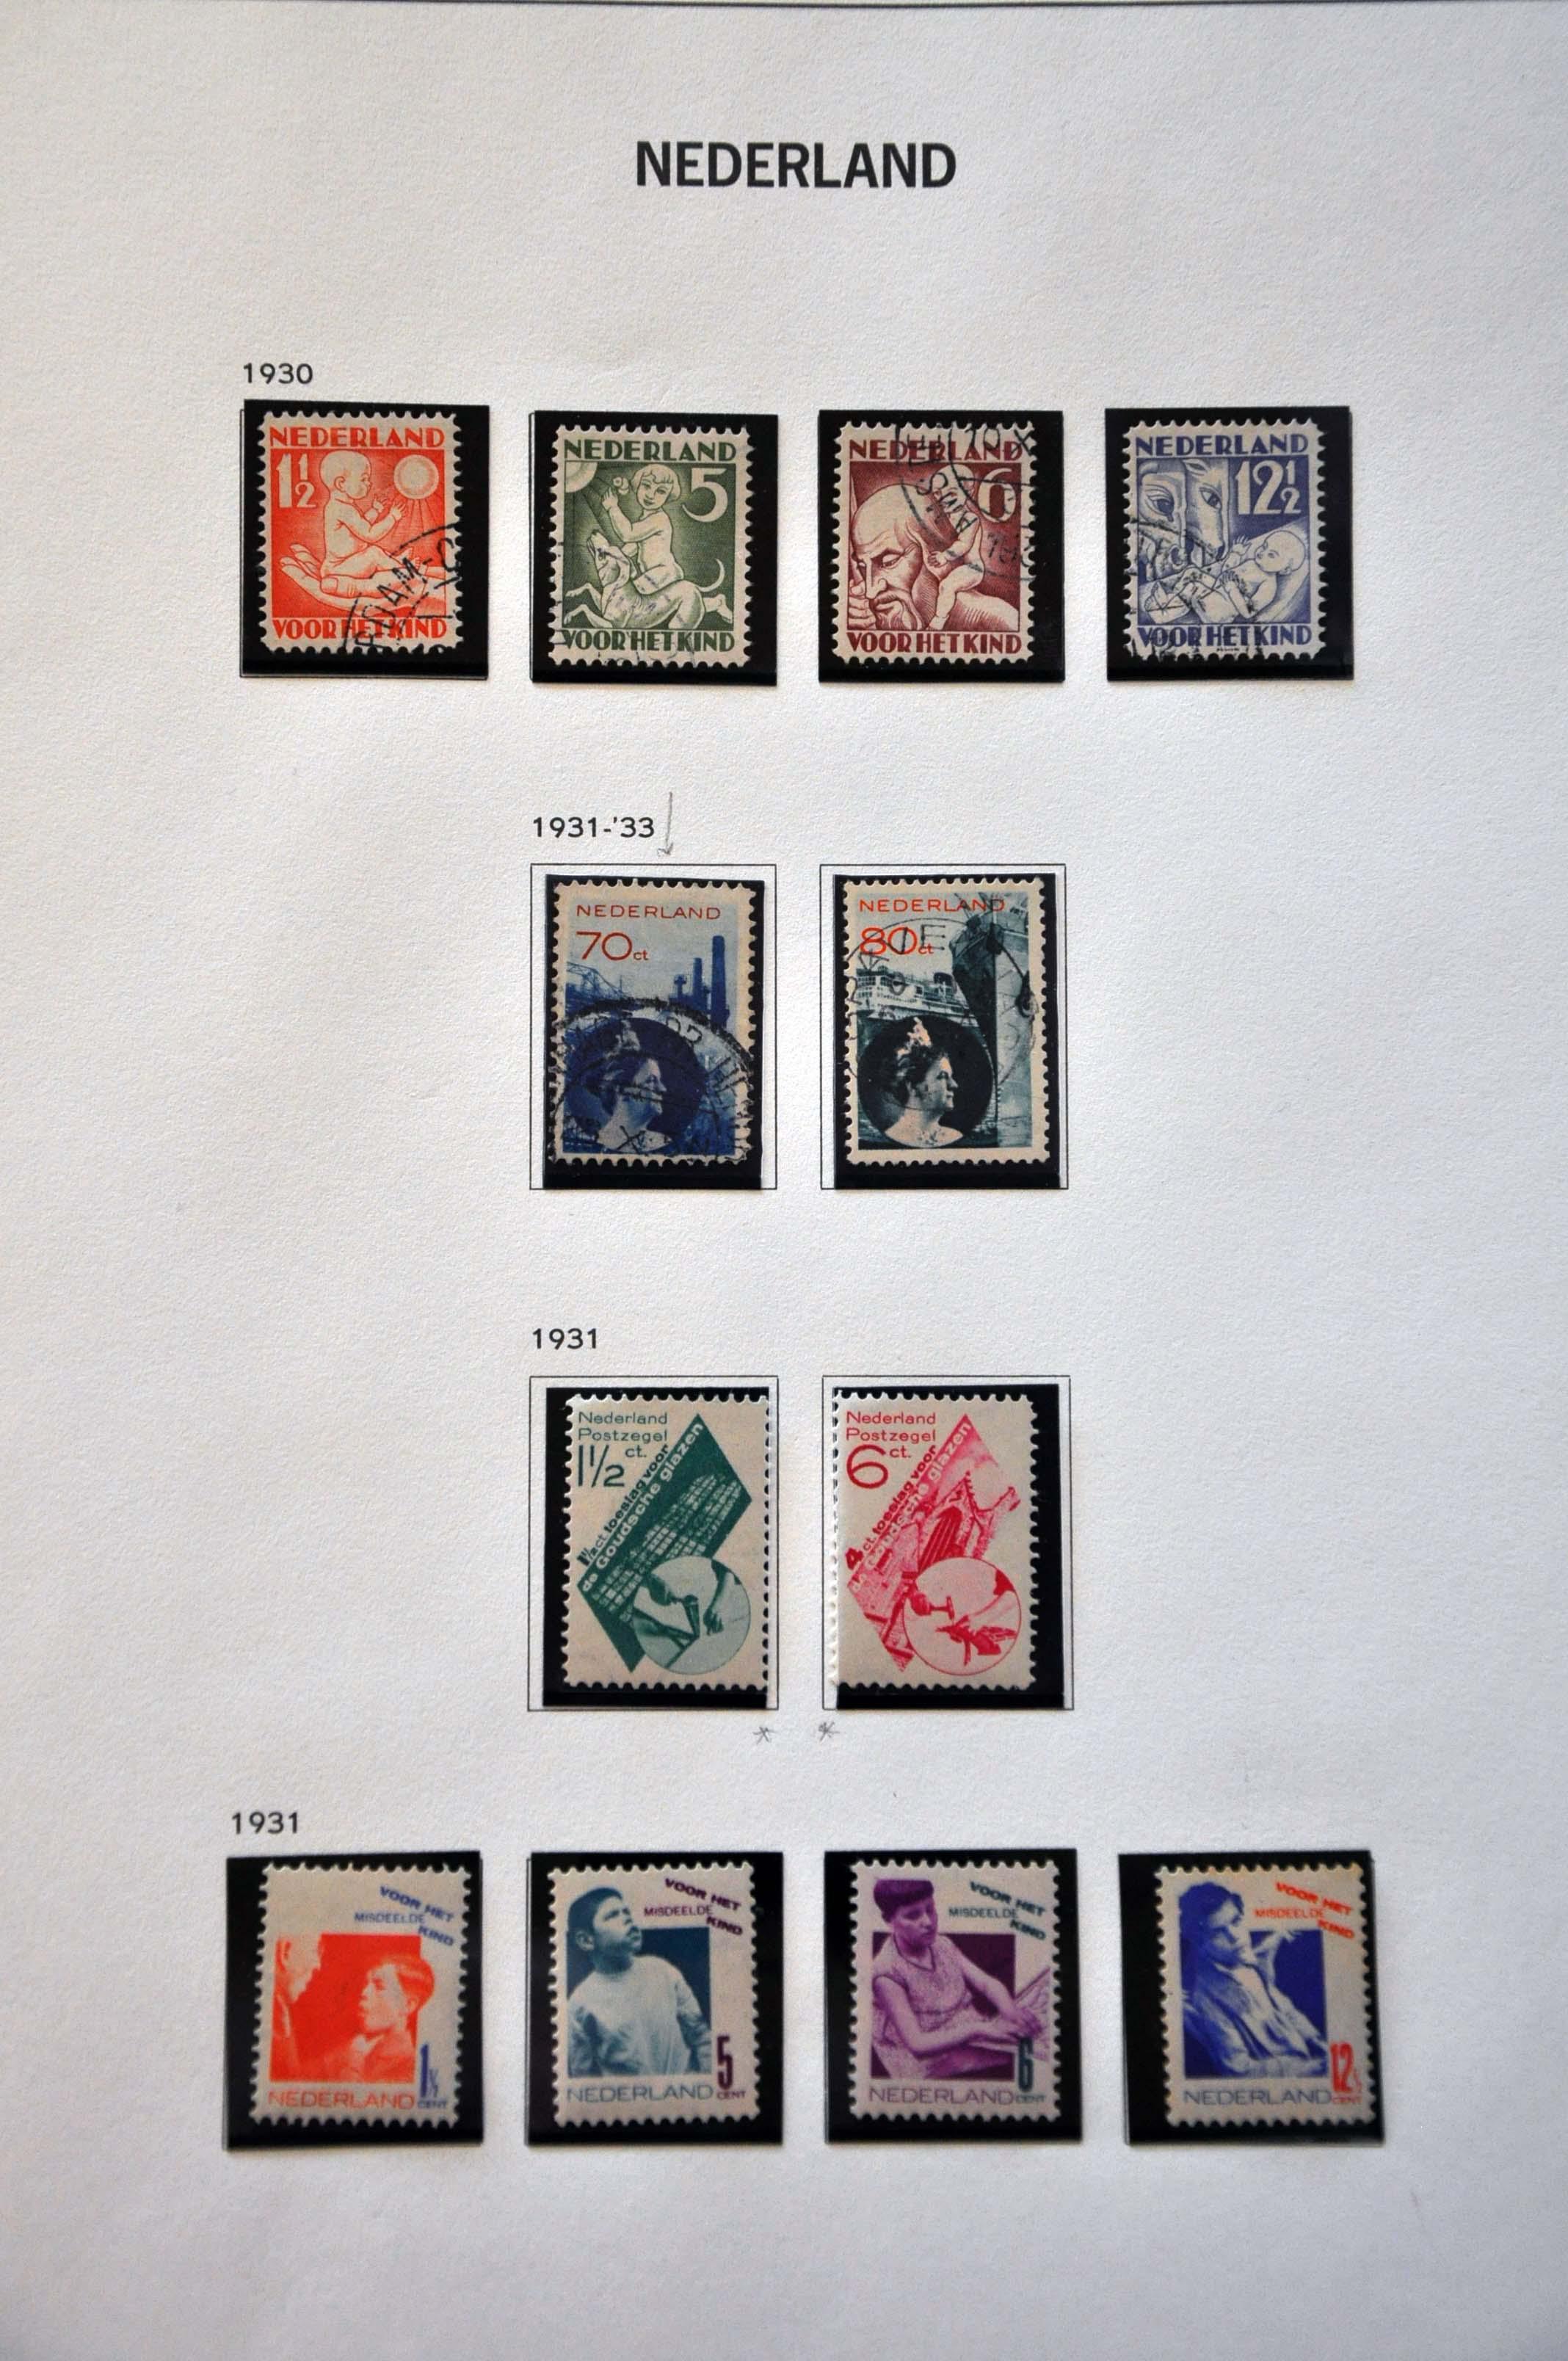 Lot 1457 - Netherlands and former colonies Netherlands -  Corinphila Veilingen Auction 239: General sale